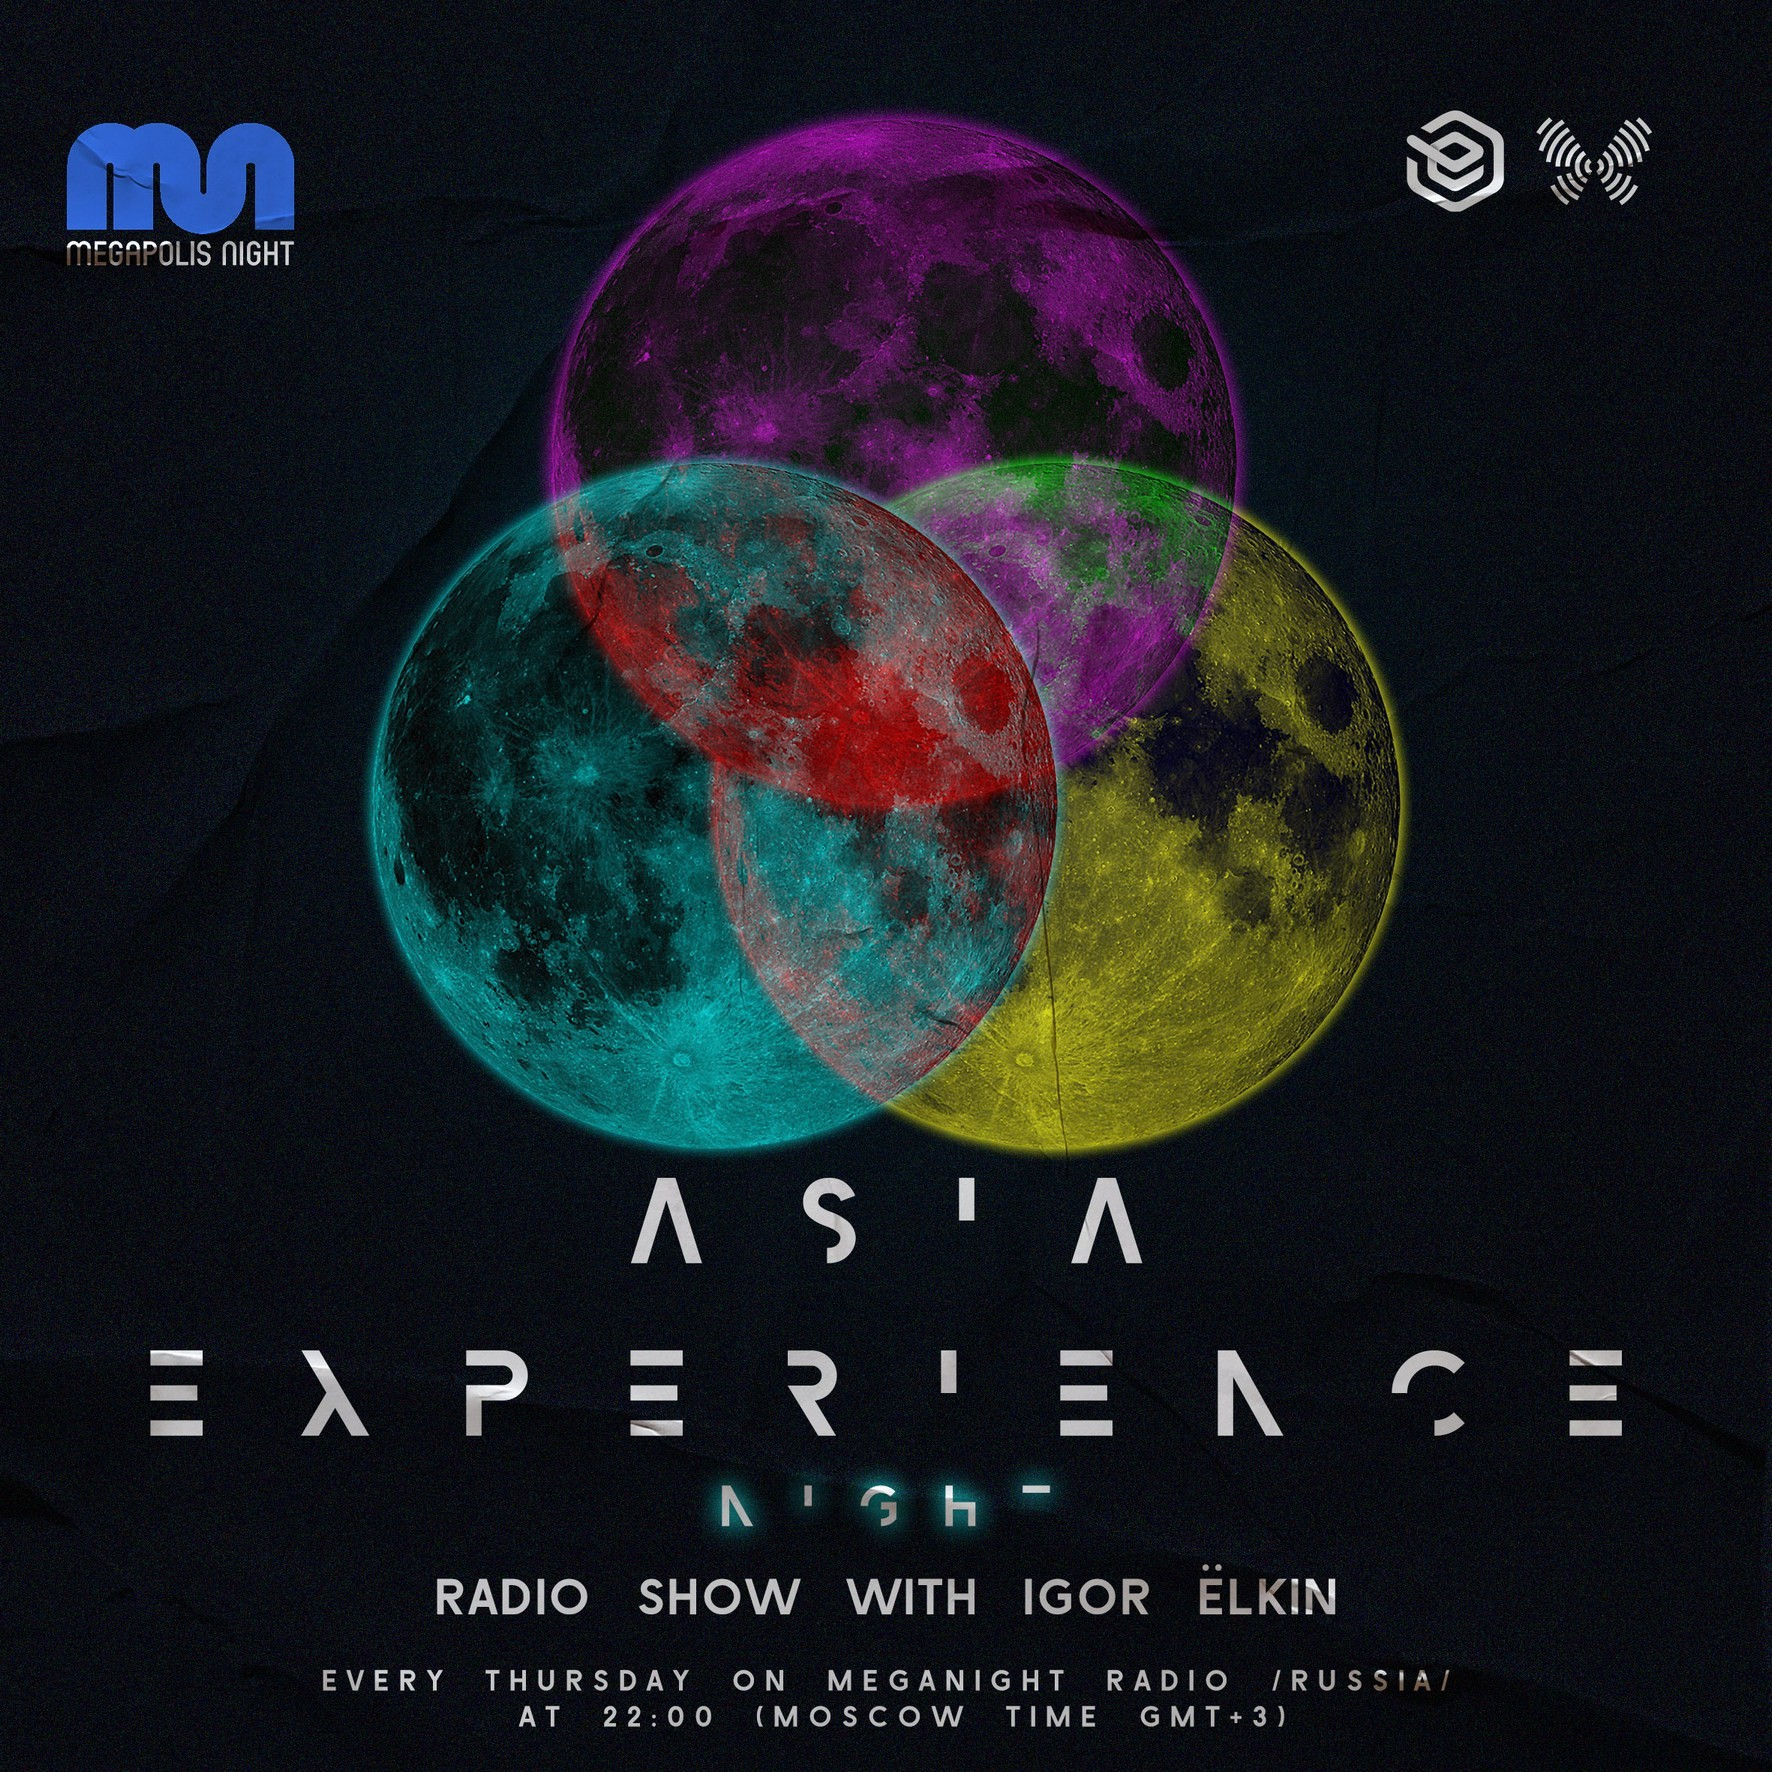 Elkin - Asia Experience Night  Radio Show #046 @ Megapolis Night  08.04.2021 #46